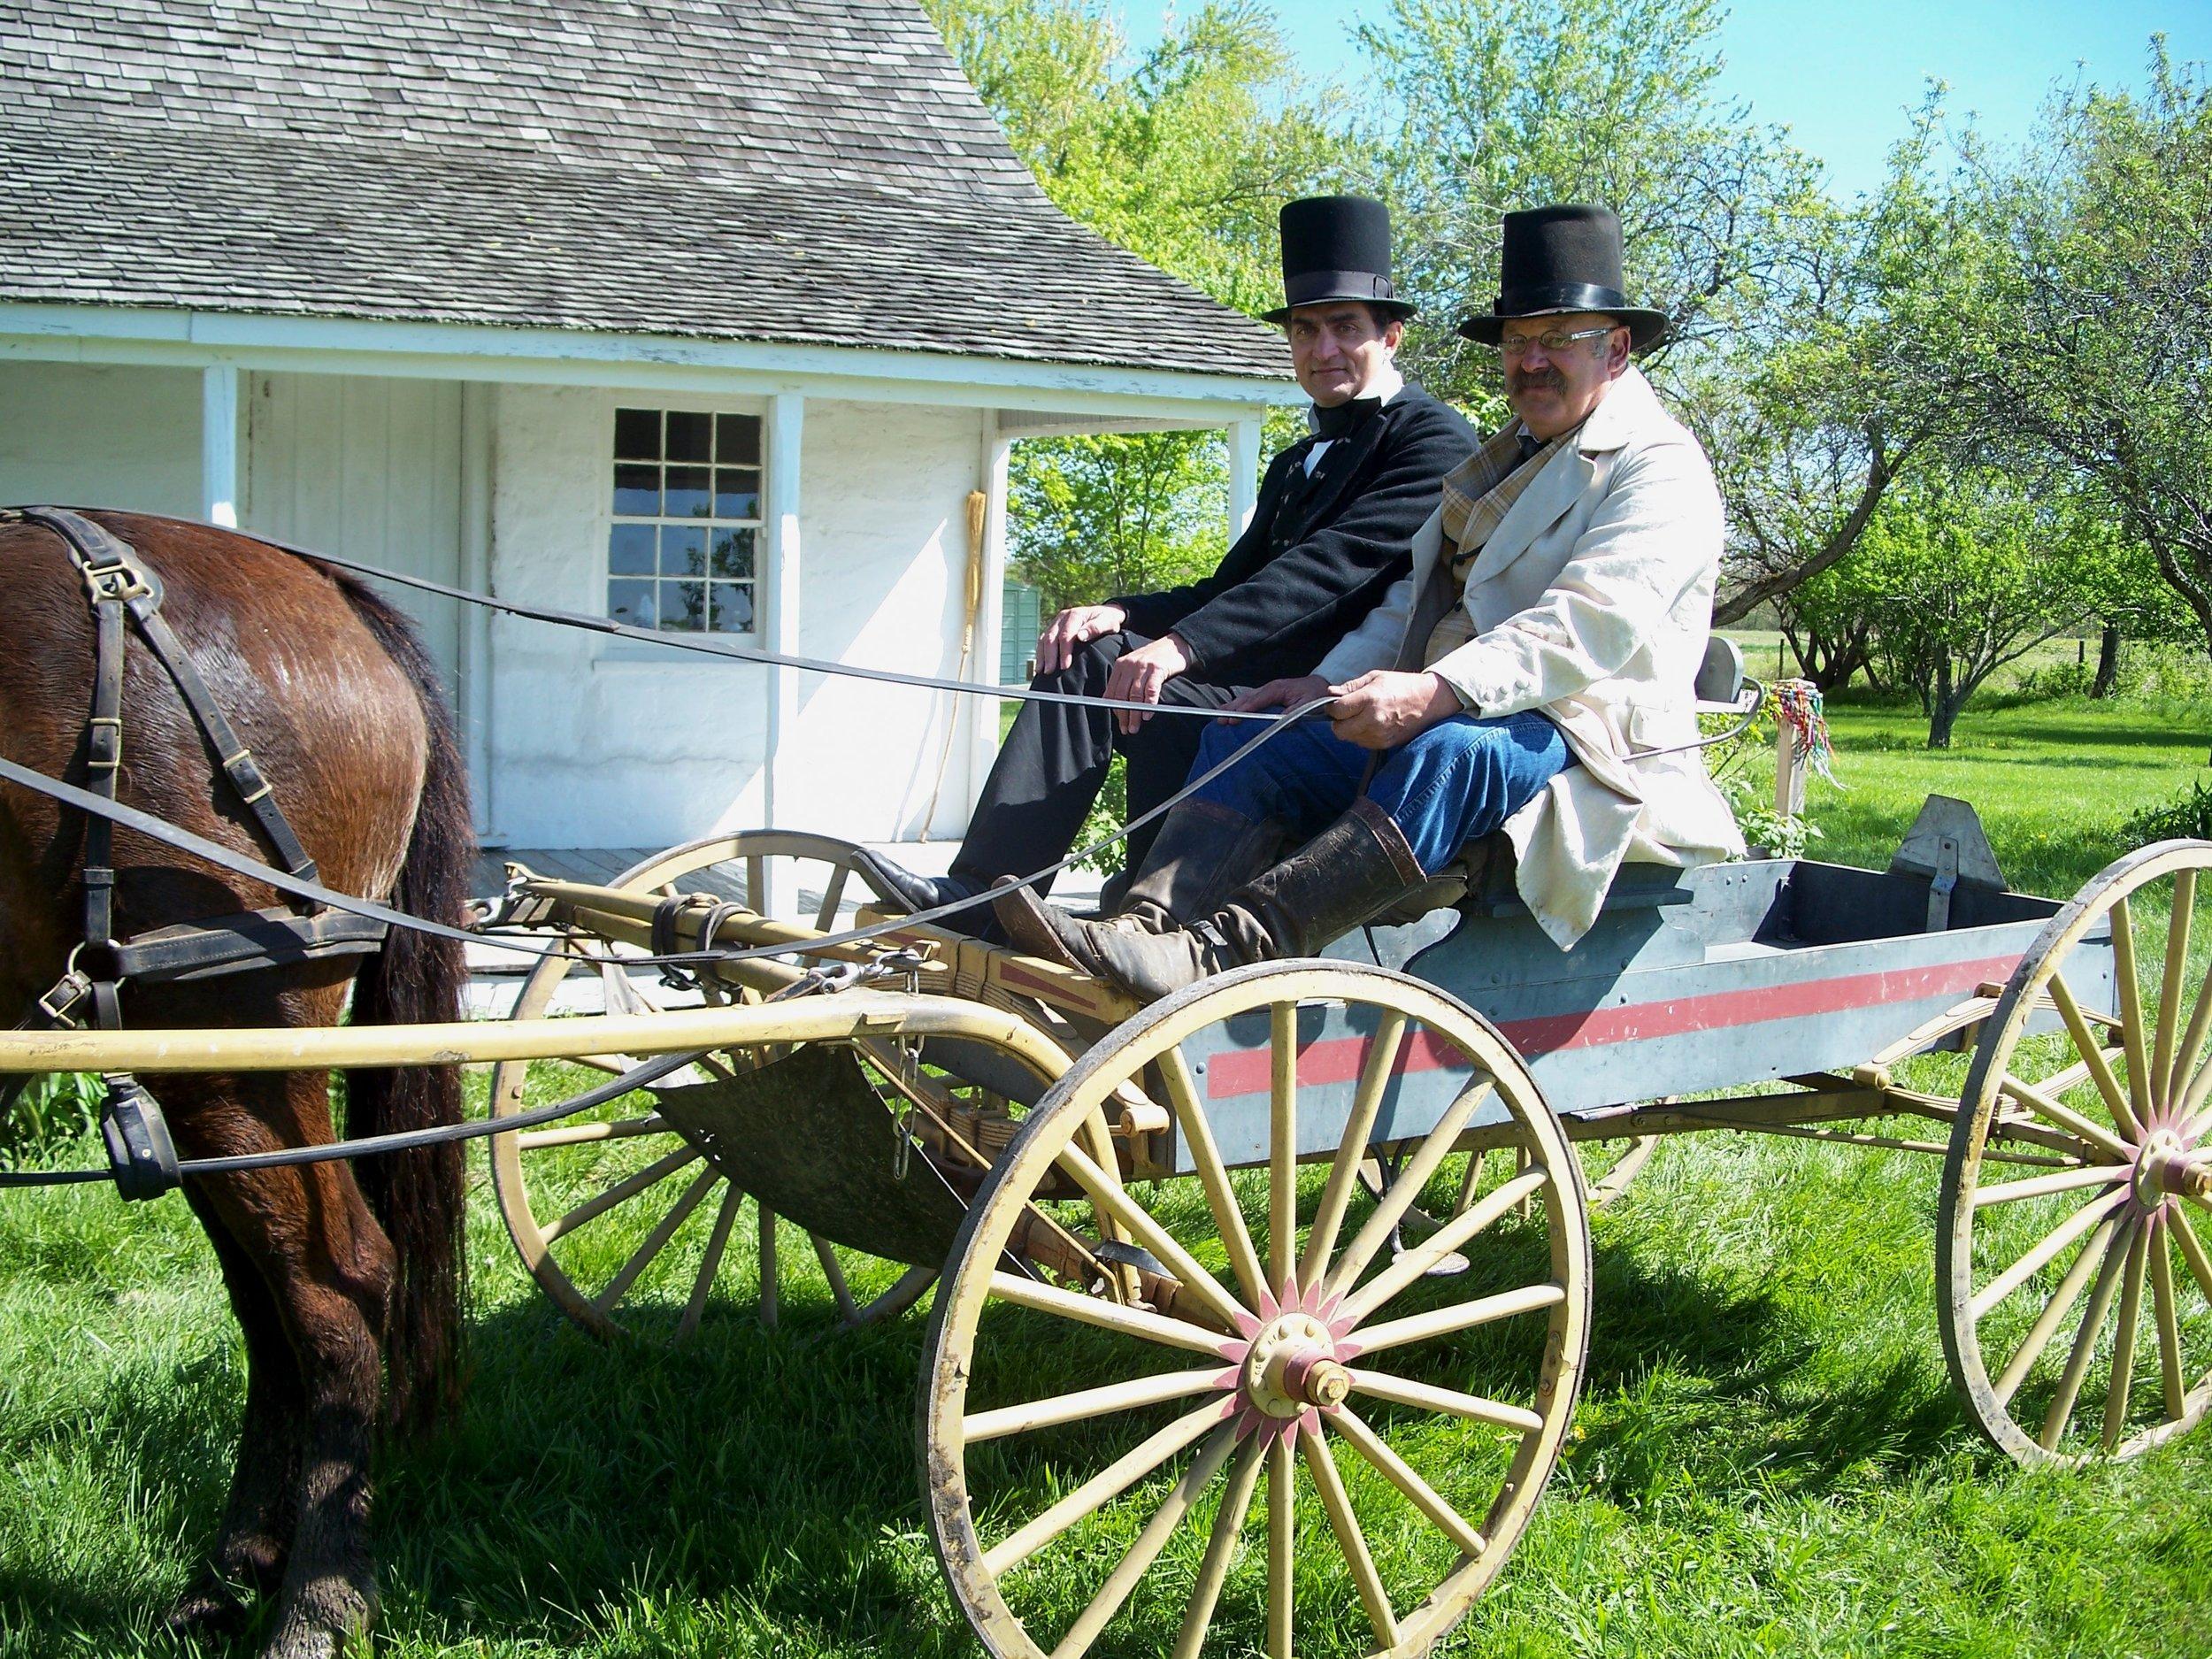 Joe Woodard as Abraham Lincoln visits the Five Mile House with Randy Jackson.